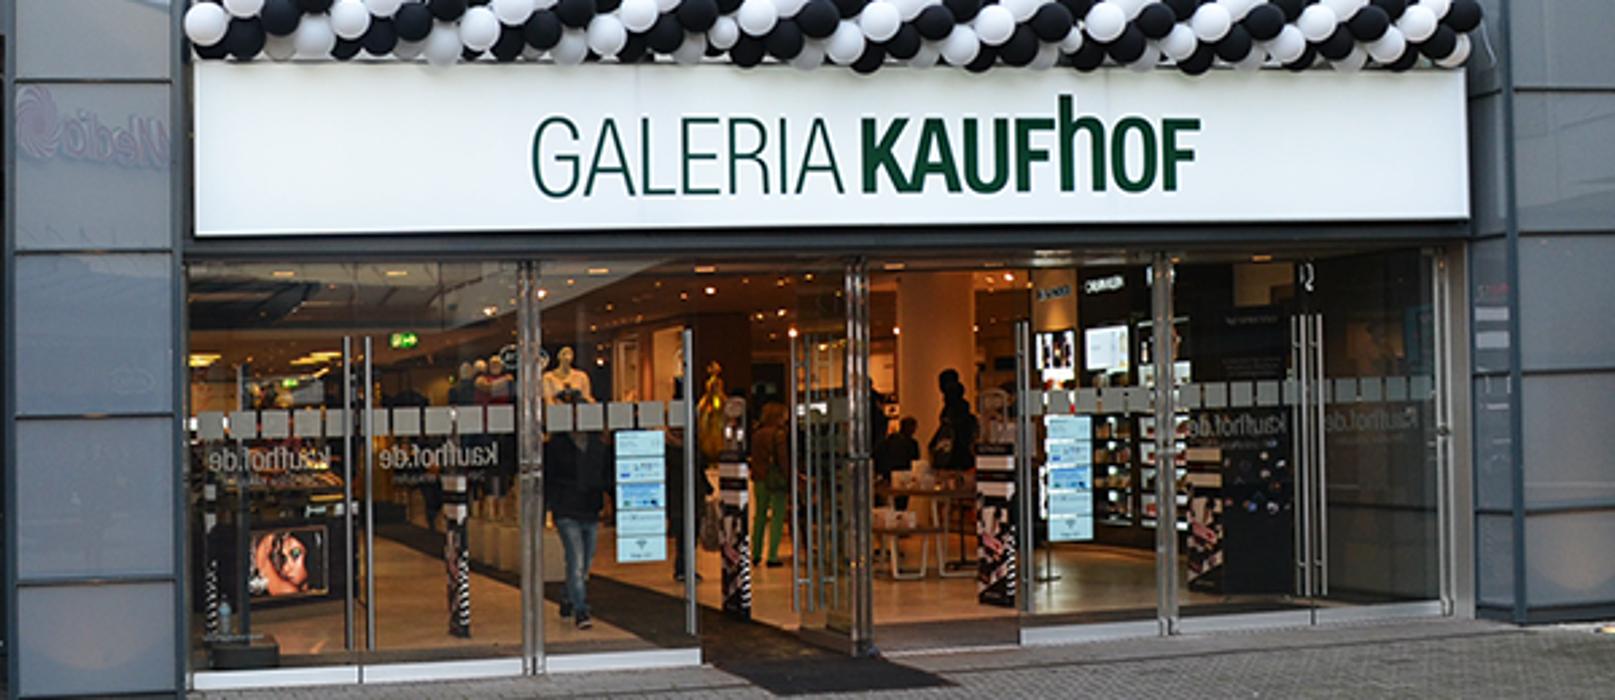 GALERIA (Kaufhof) Sulzbach Main-Taunus-Zentrum, Main-Taunus-Zentrum in Sulzbach (Taunus)